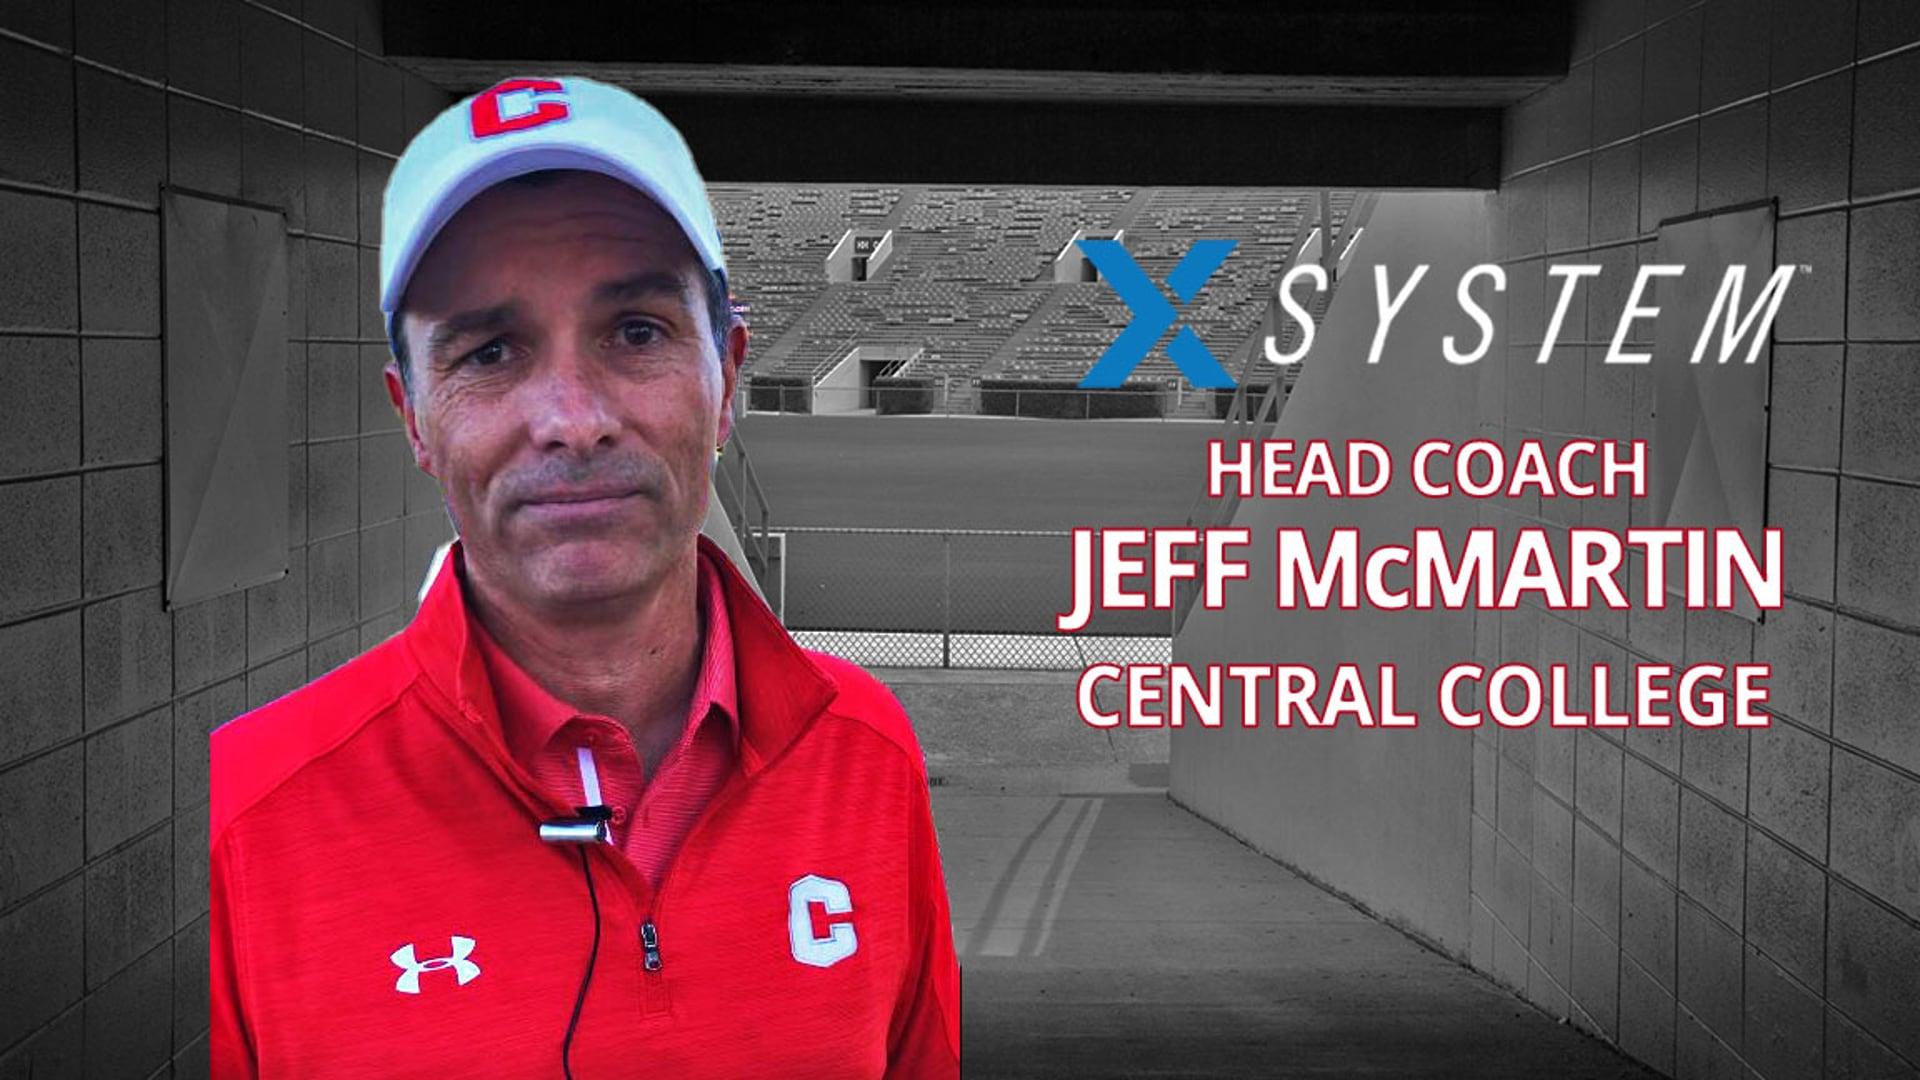 XSystem: Jeff McMartin, Central College